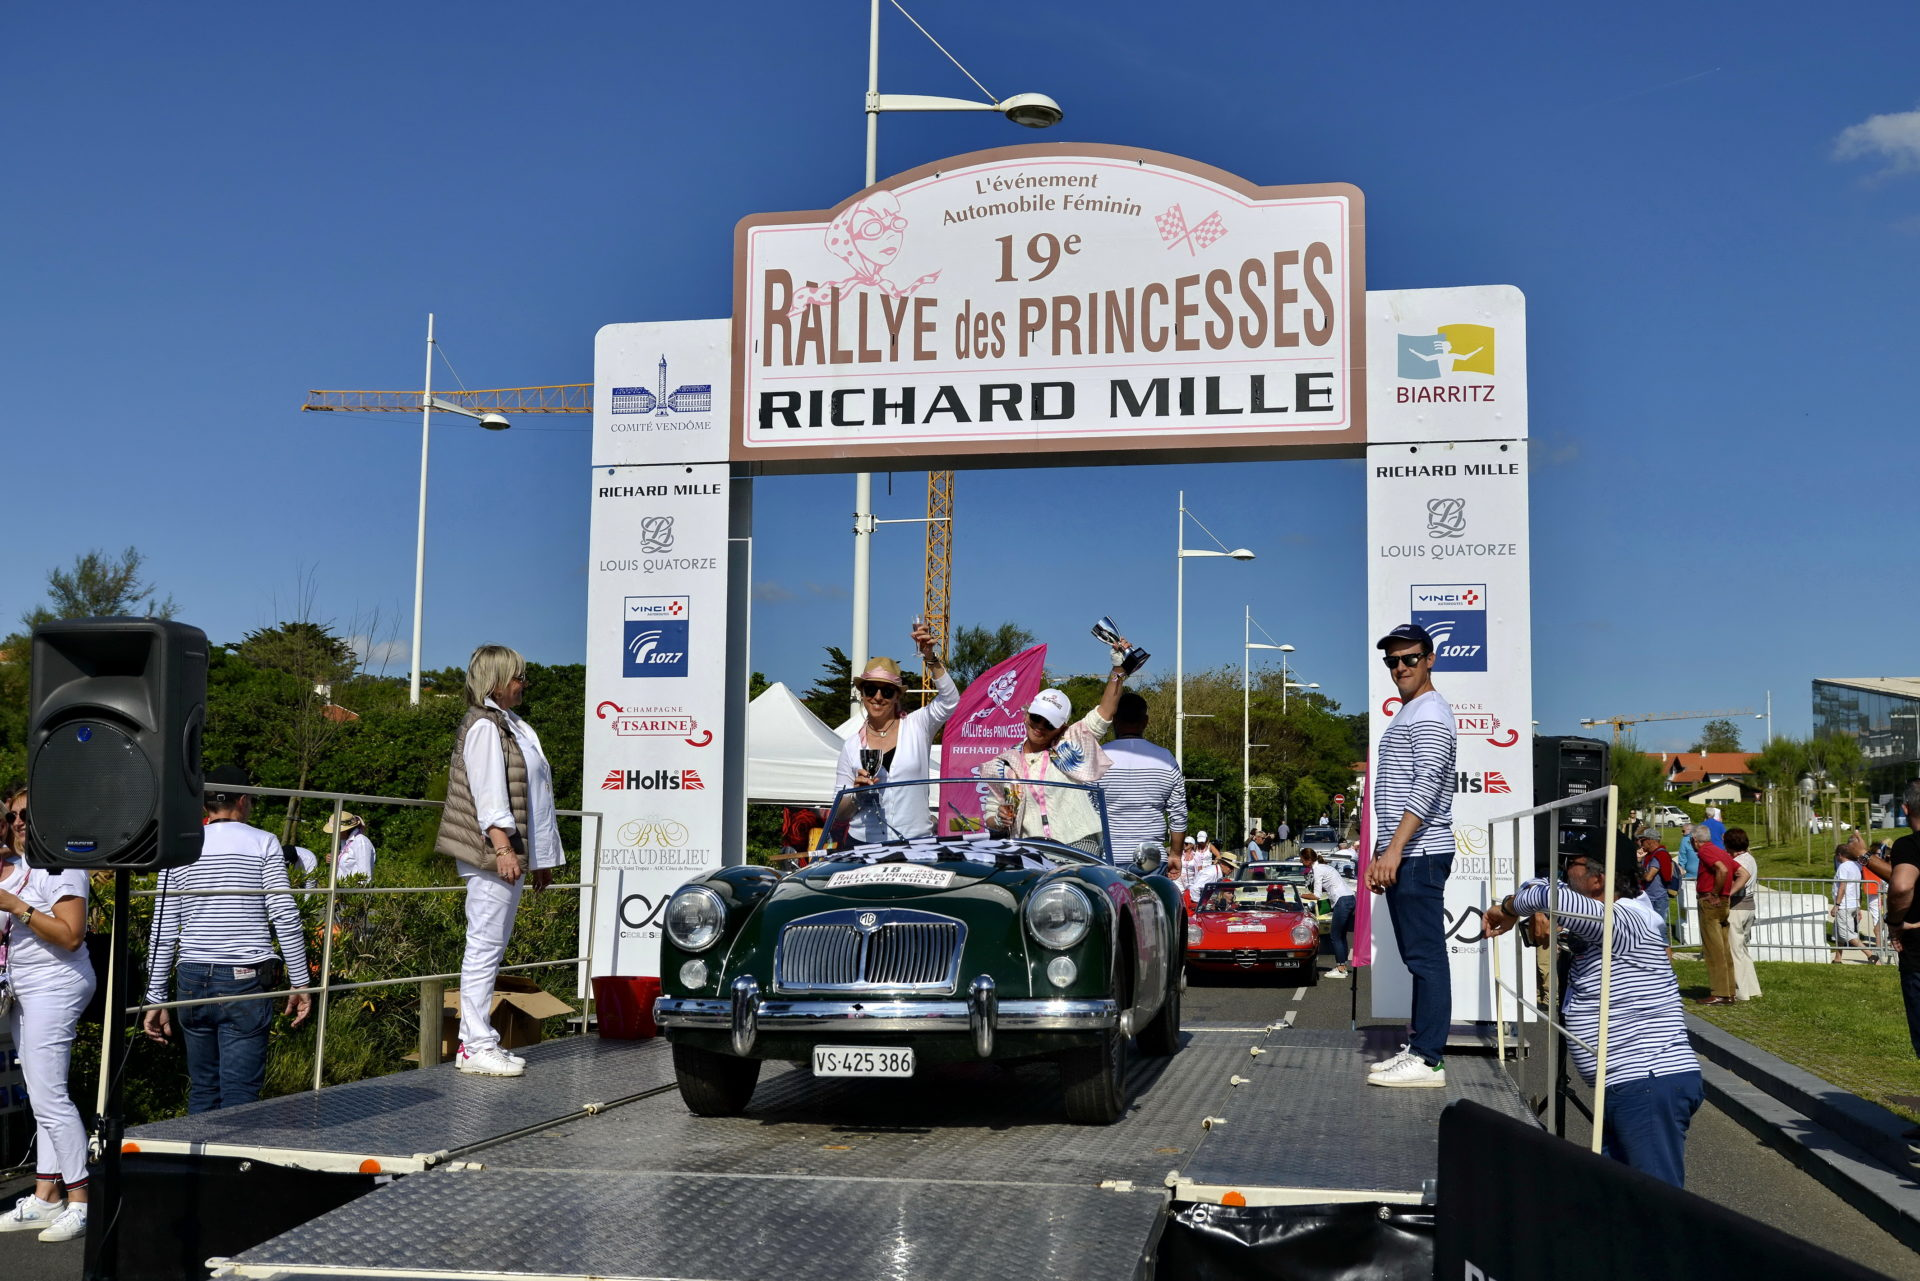 Rallye des Princesses 2018